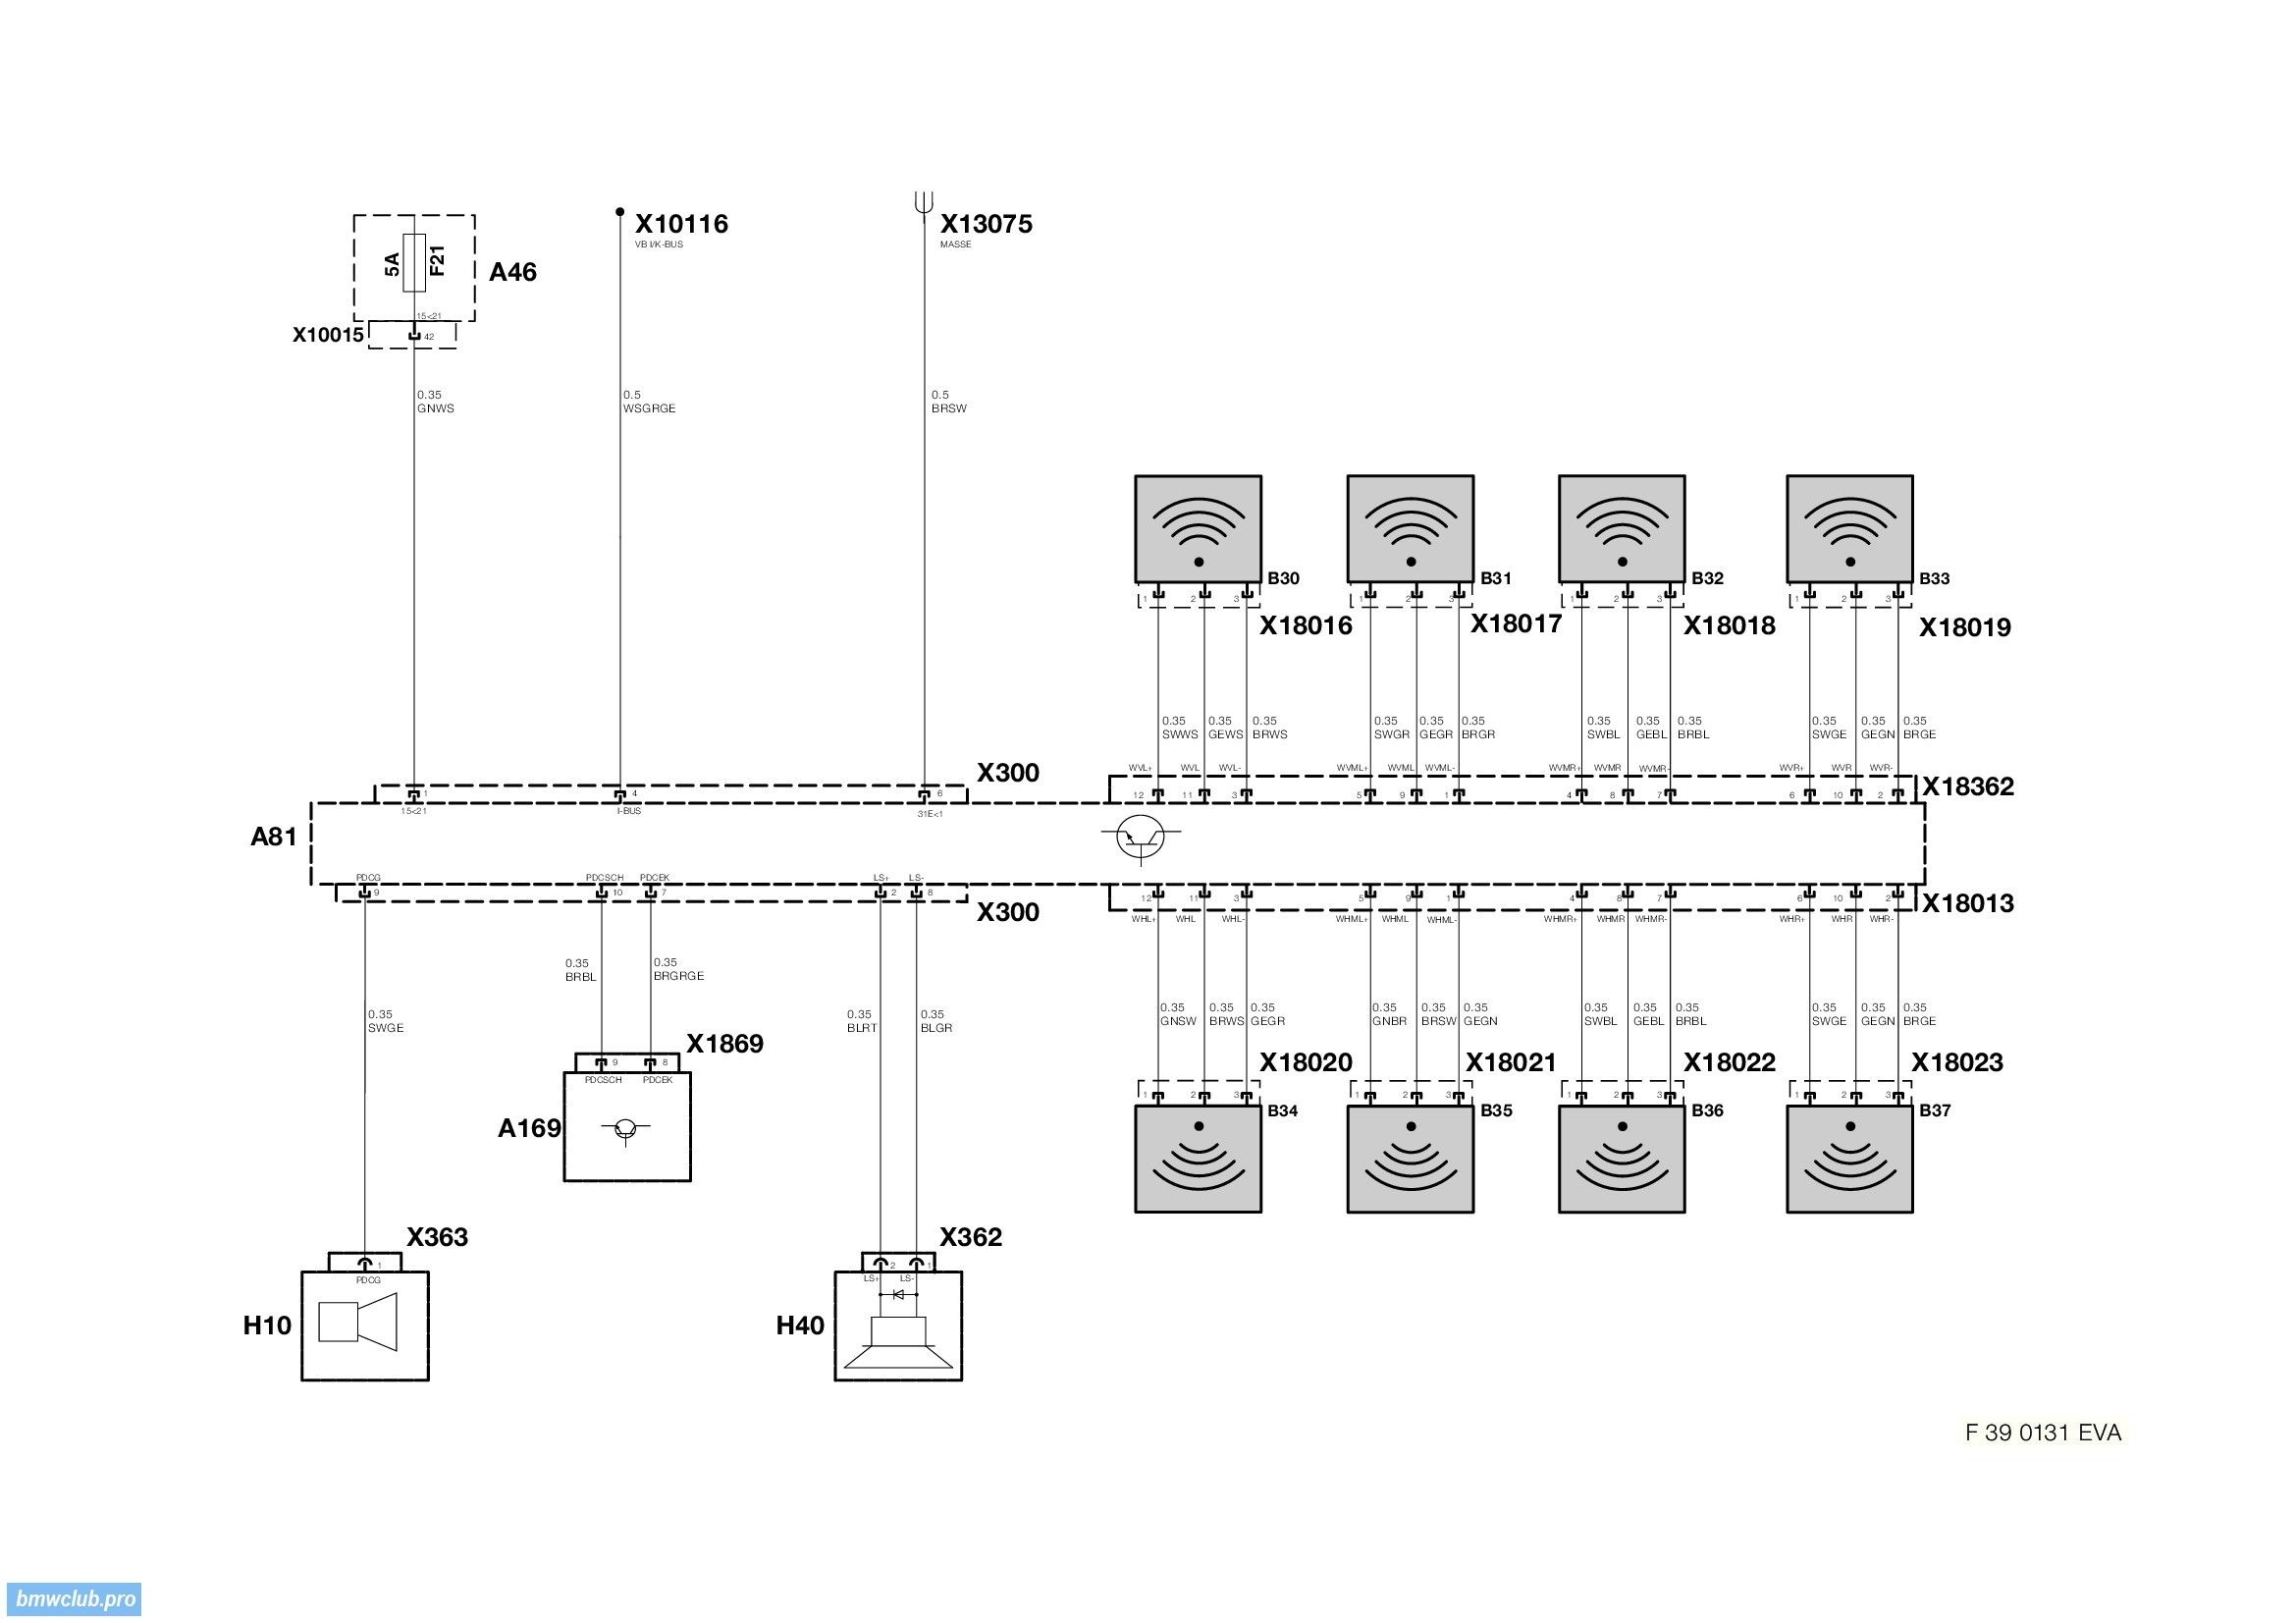 bmw e46 central locking wiring diagram diagram diagramtemplate bmw e46 central locking wiring diagram diagram diagramtemplate [ 2339 x 1653 Pixel ]